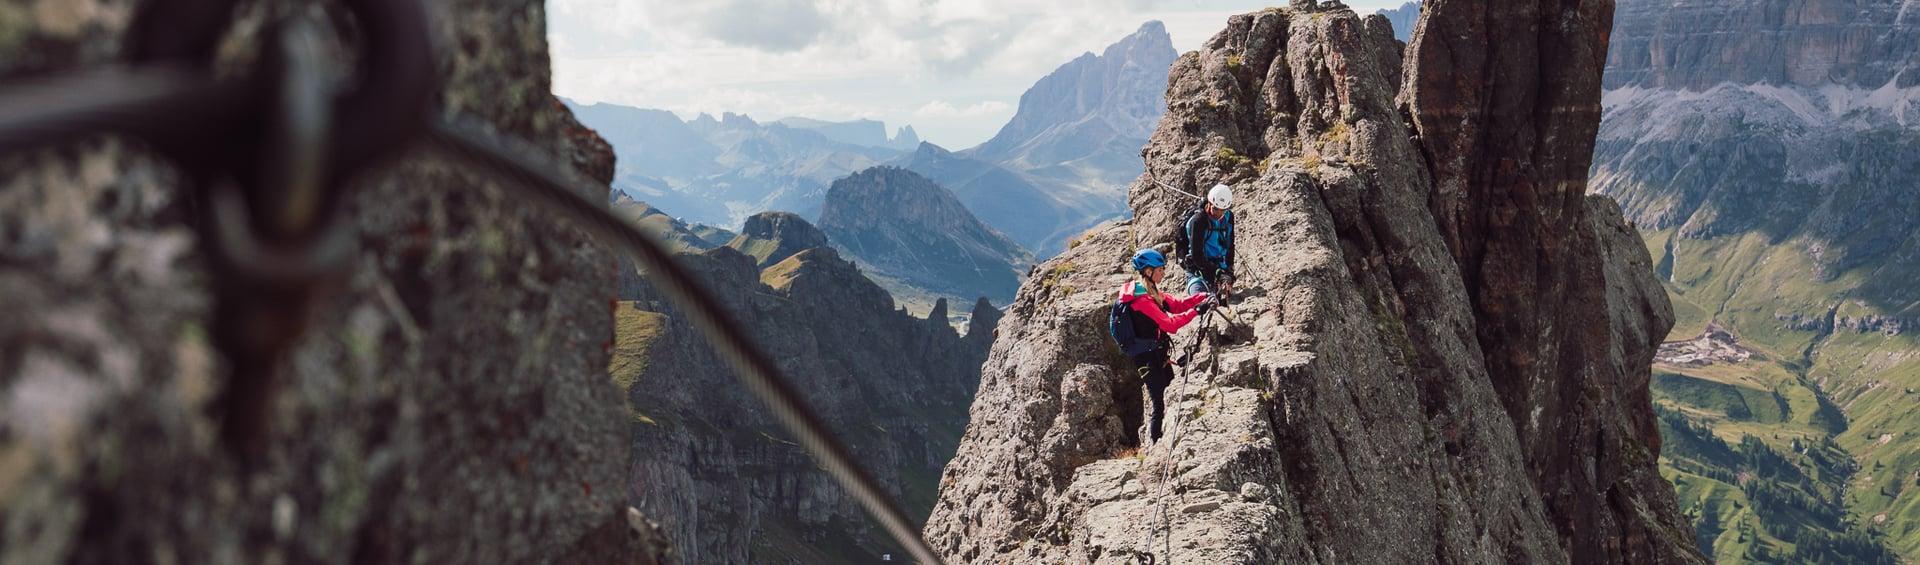 Mountain Guide & Mid-mountain Guide